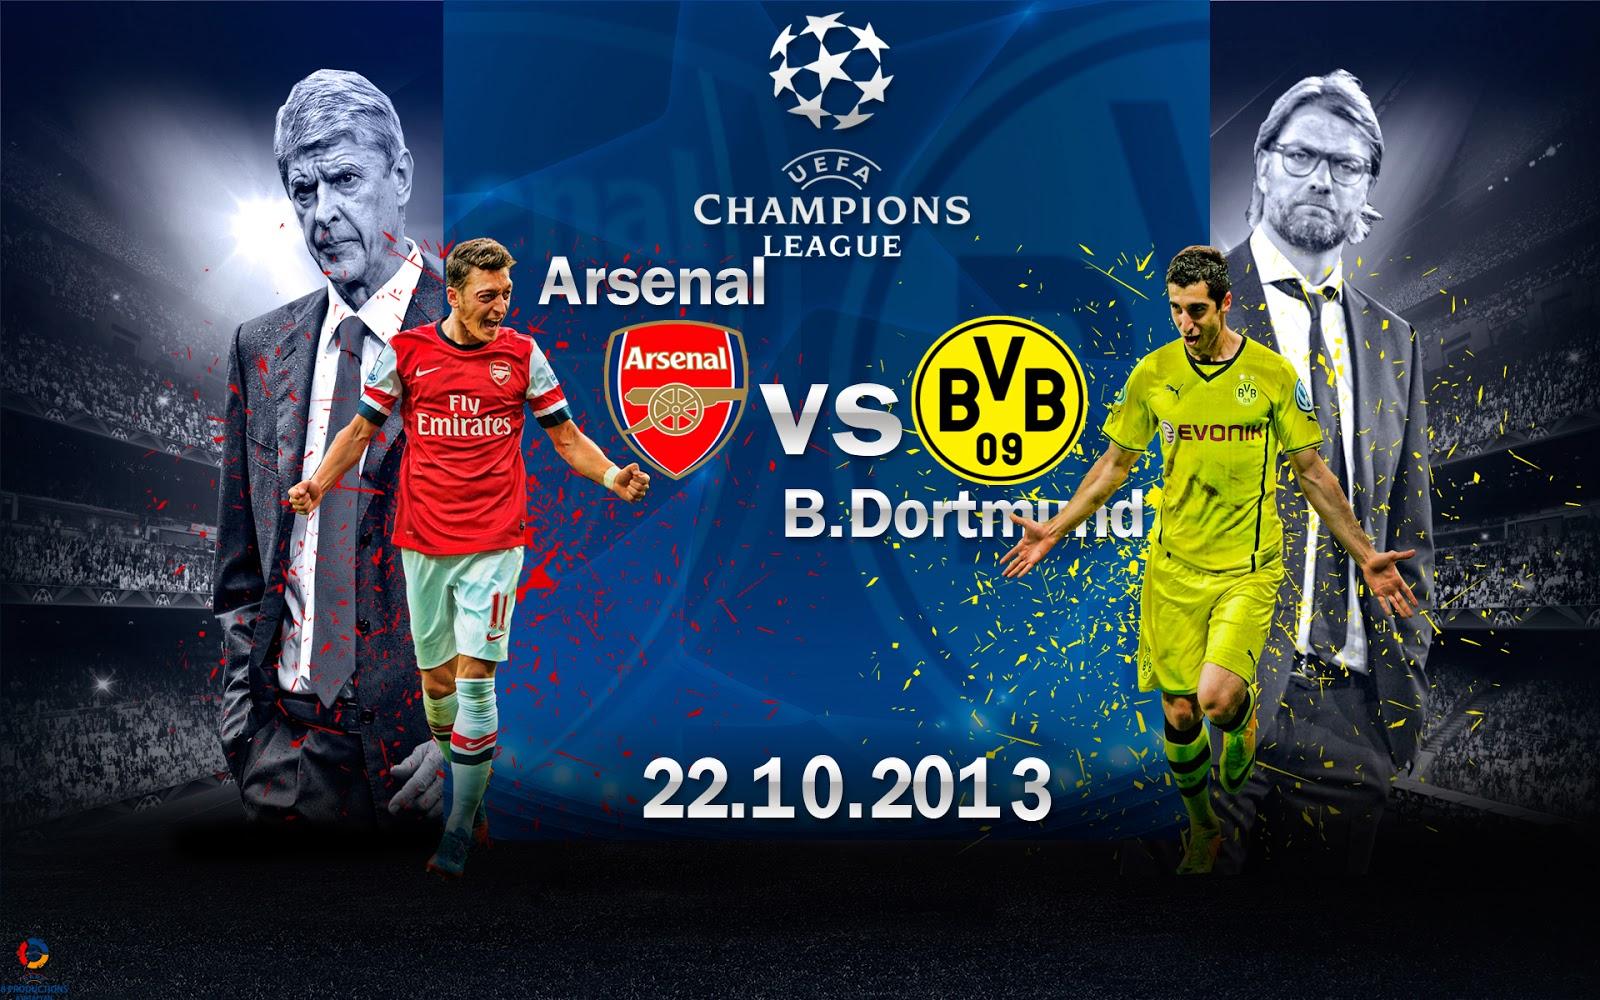 bvb arsenal champions league